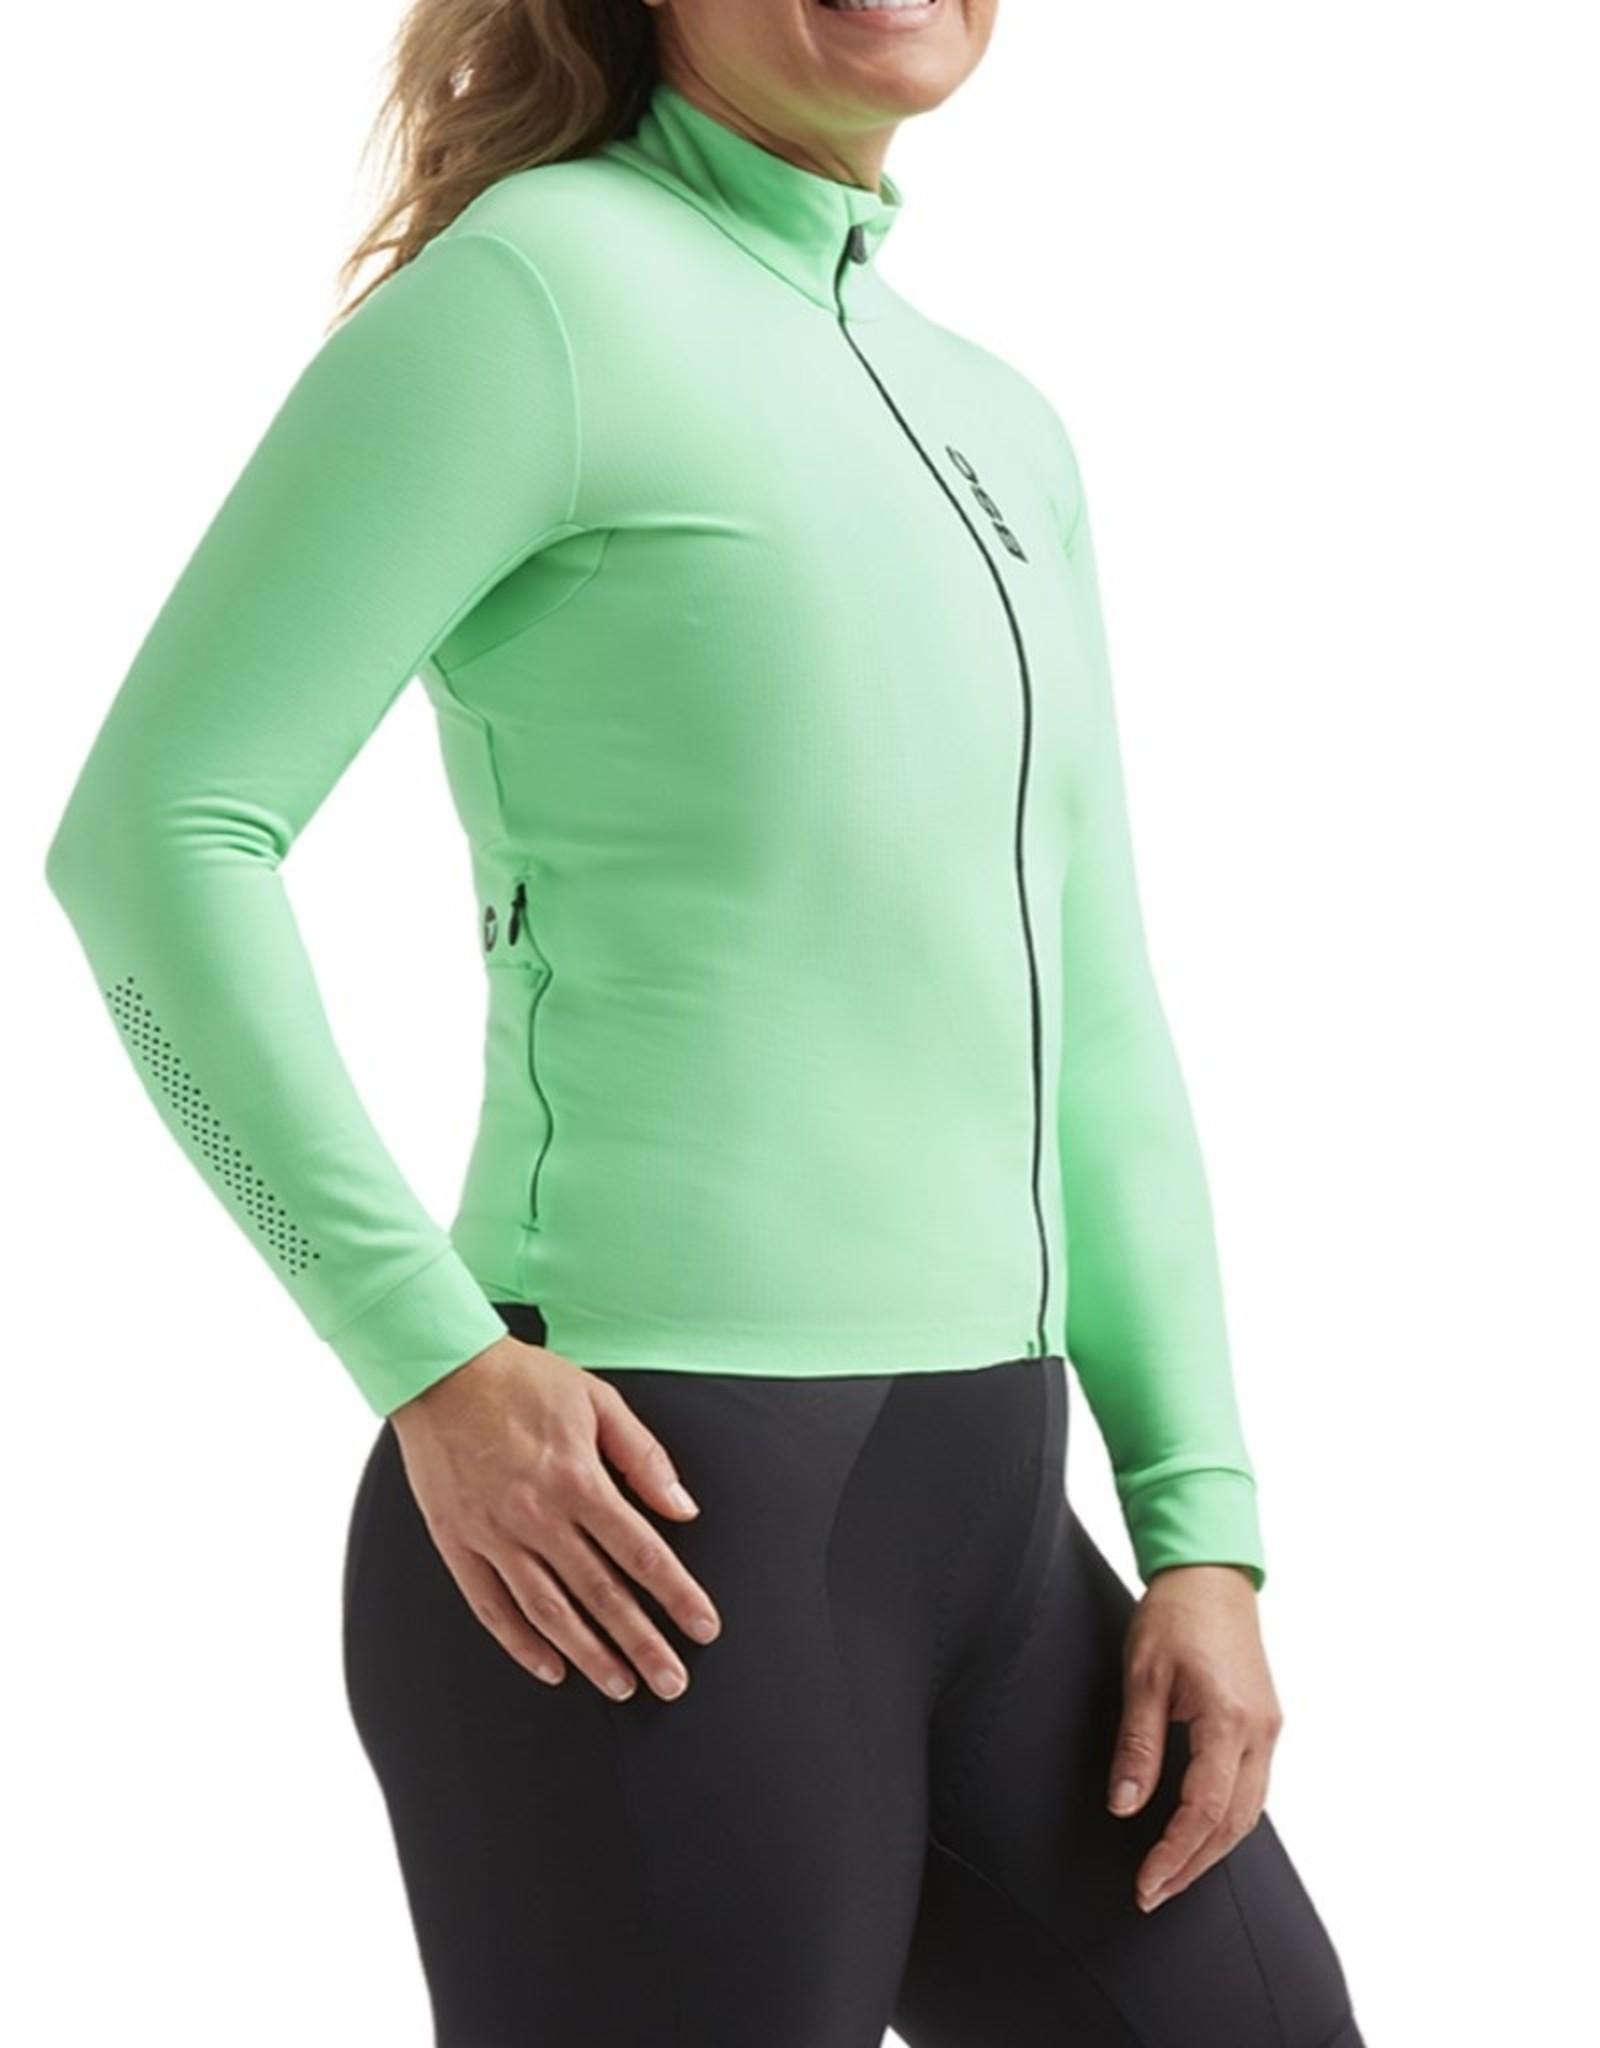 Black Sheep Cycling Women's Elements Thermische fietsjas - Groen